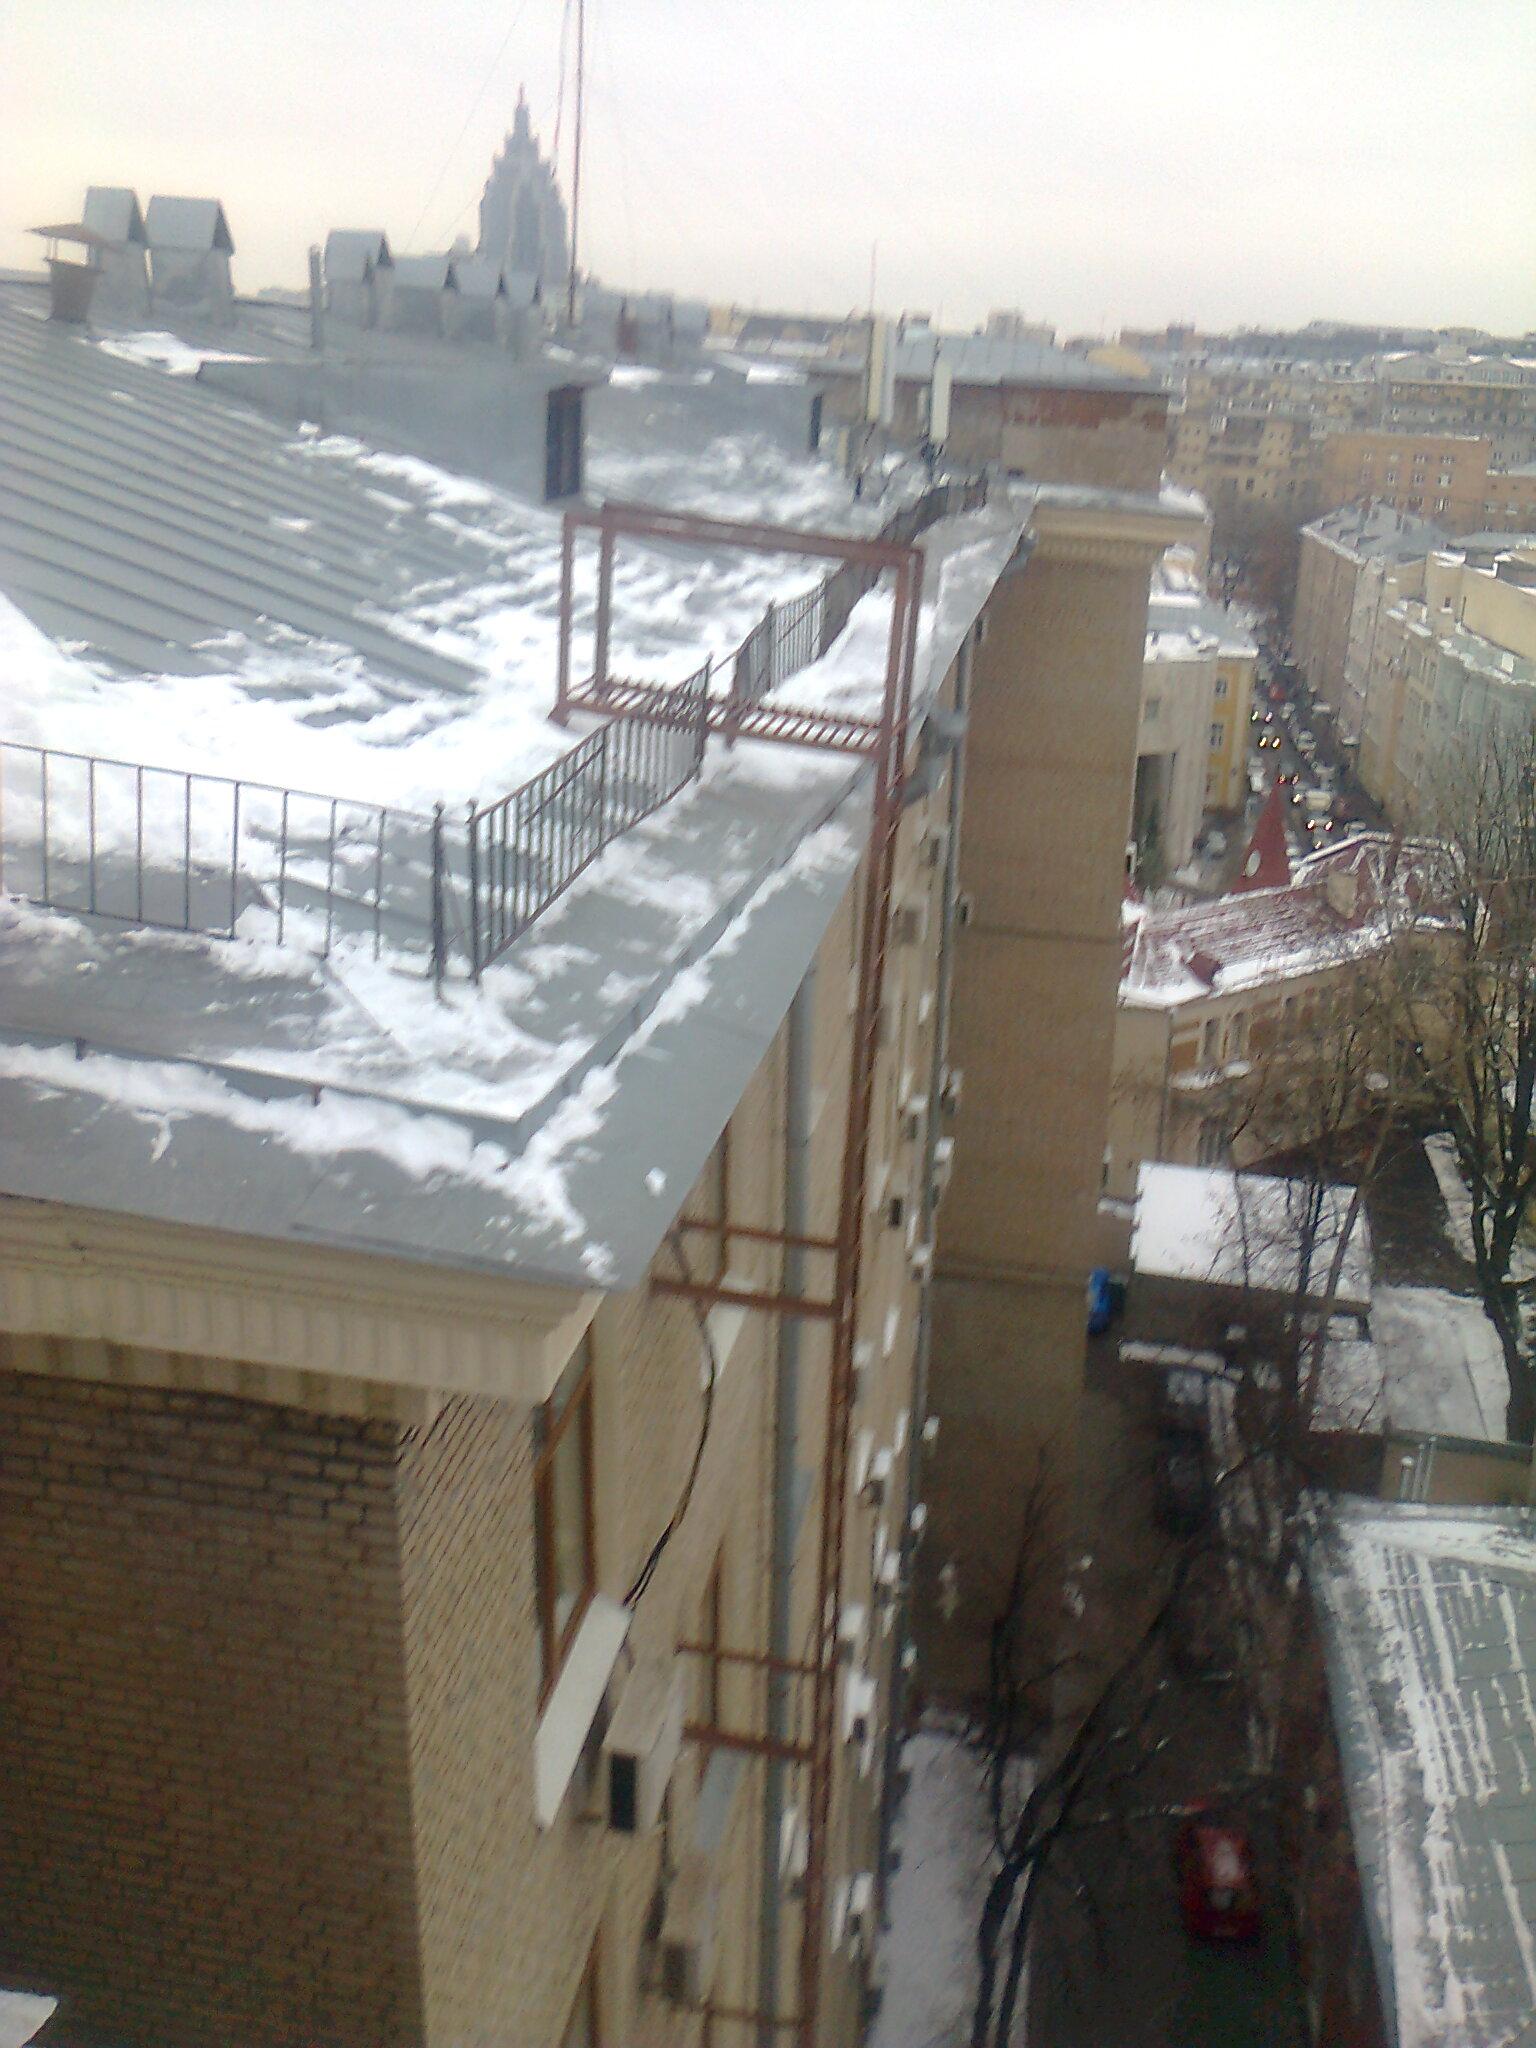 Технология очистки крыш от снега